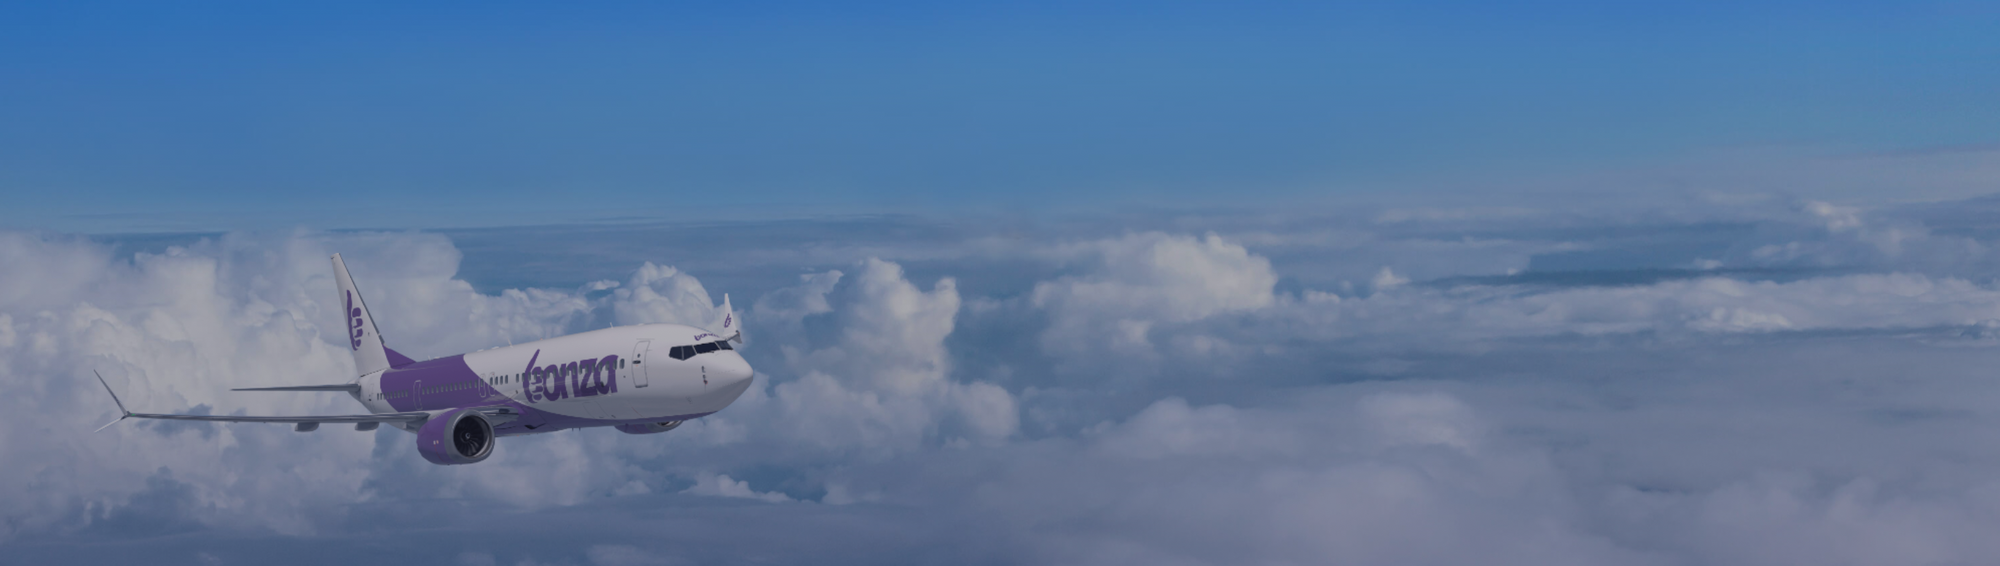 Bonza airfares coming to Australia